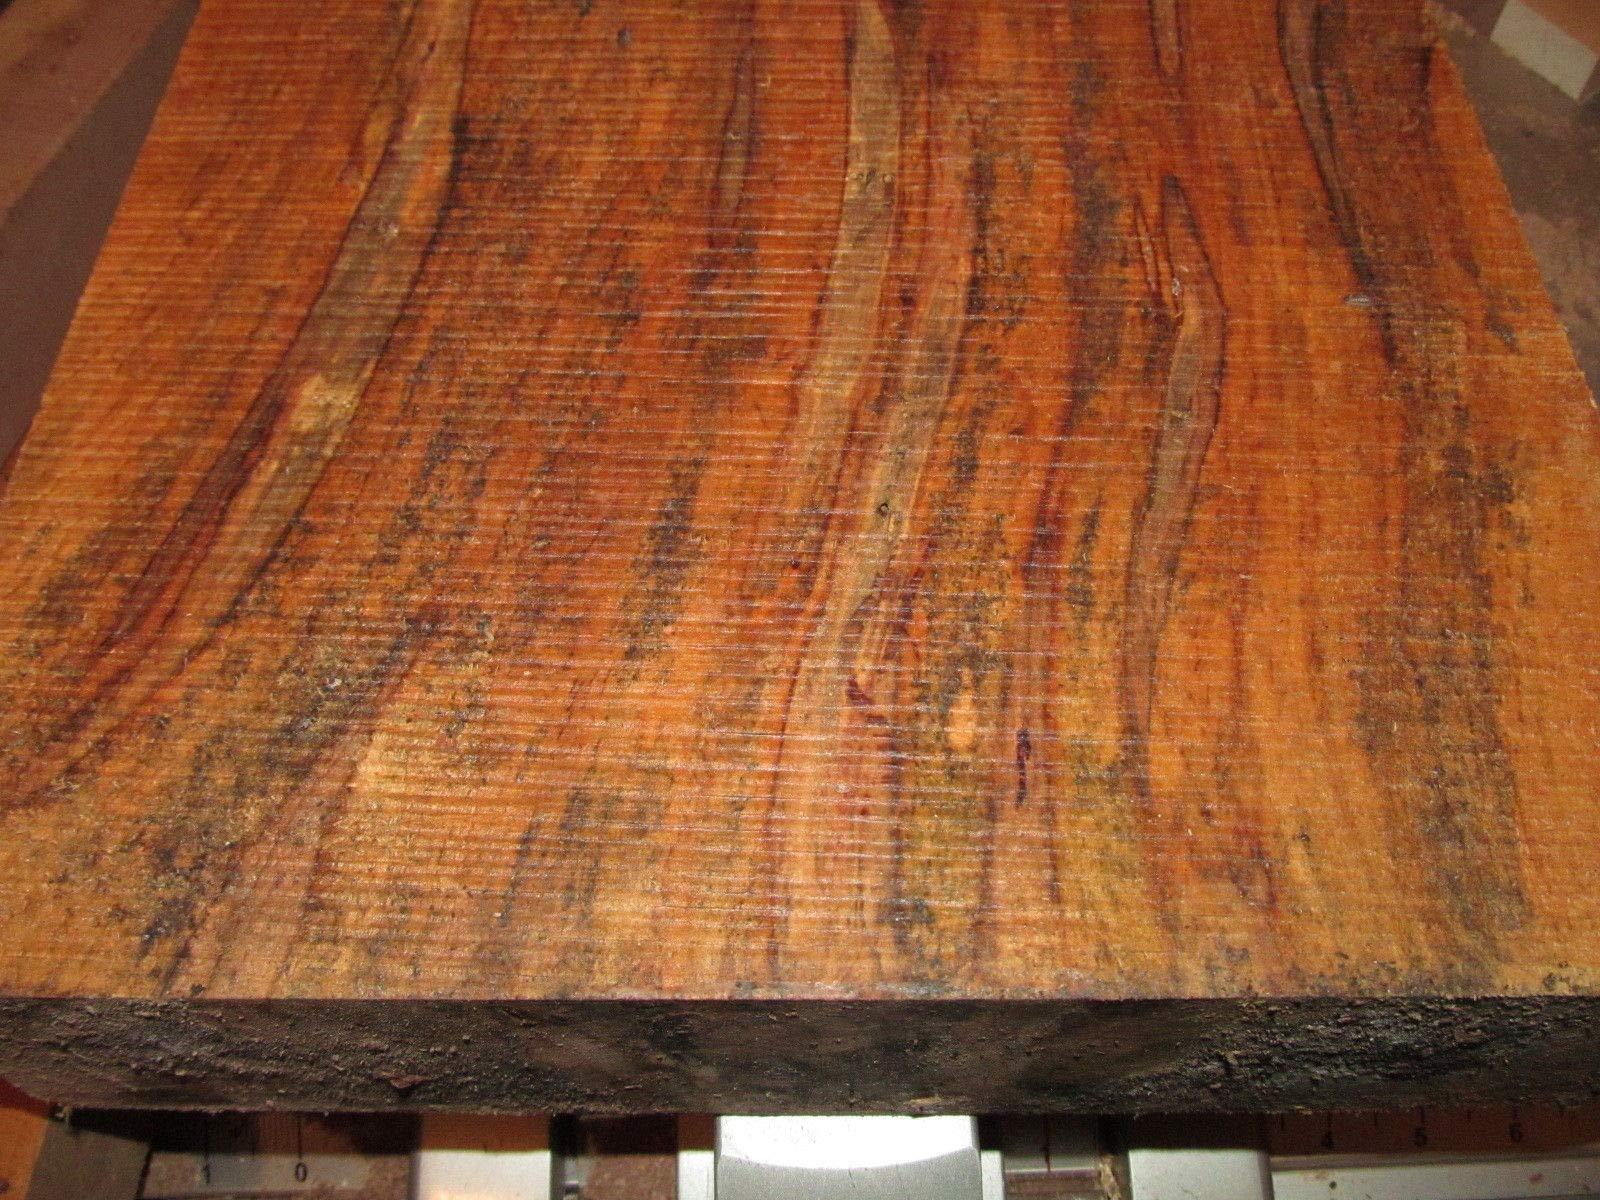 Wood) Beautiful KILN Dried Ambrosia Maple Bowl Blank Turning Lumber Wood 12 X 12 X 3'' by (High Quality Wood)